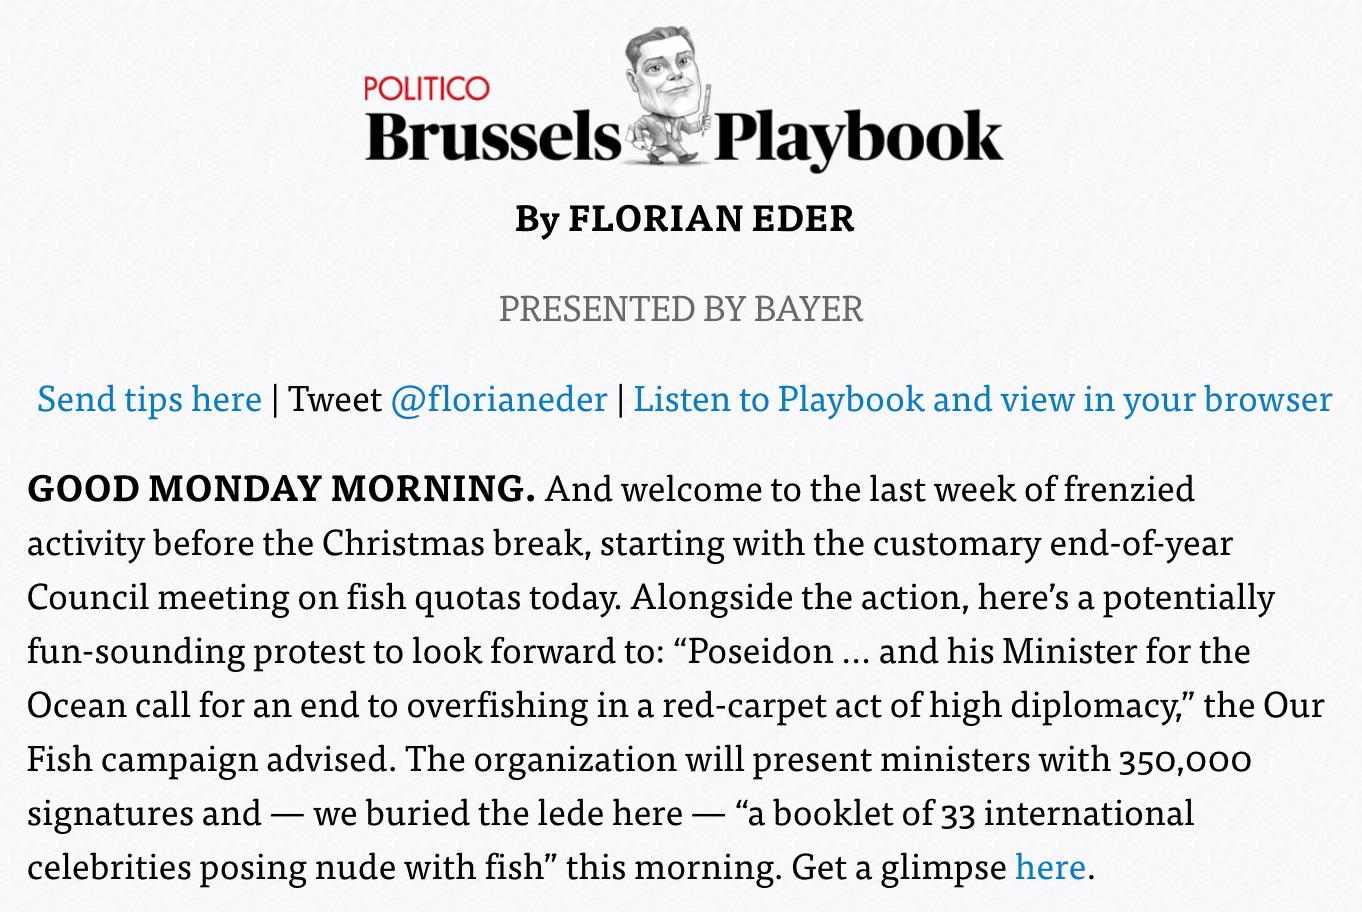 Brussels Playbook Poseidon